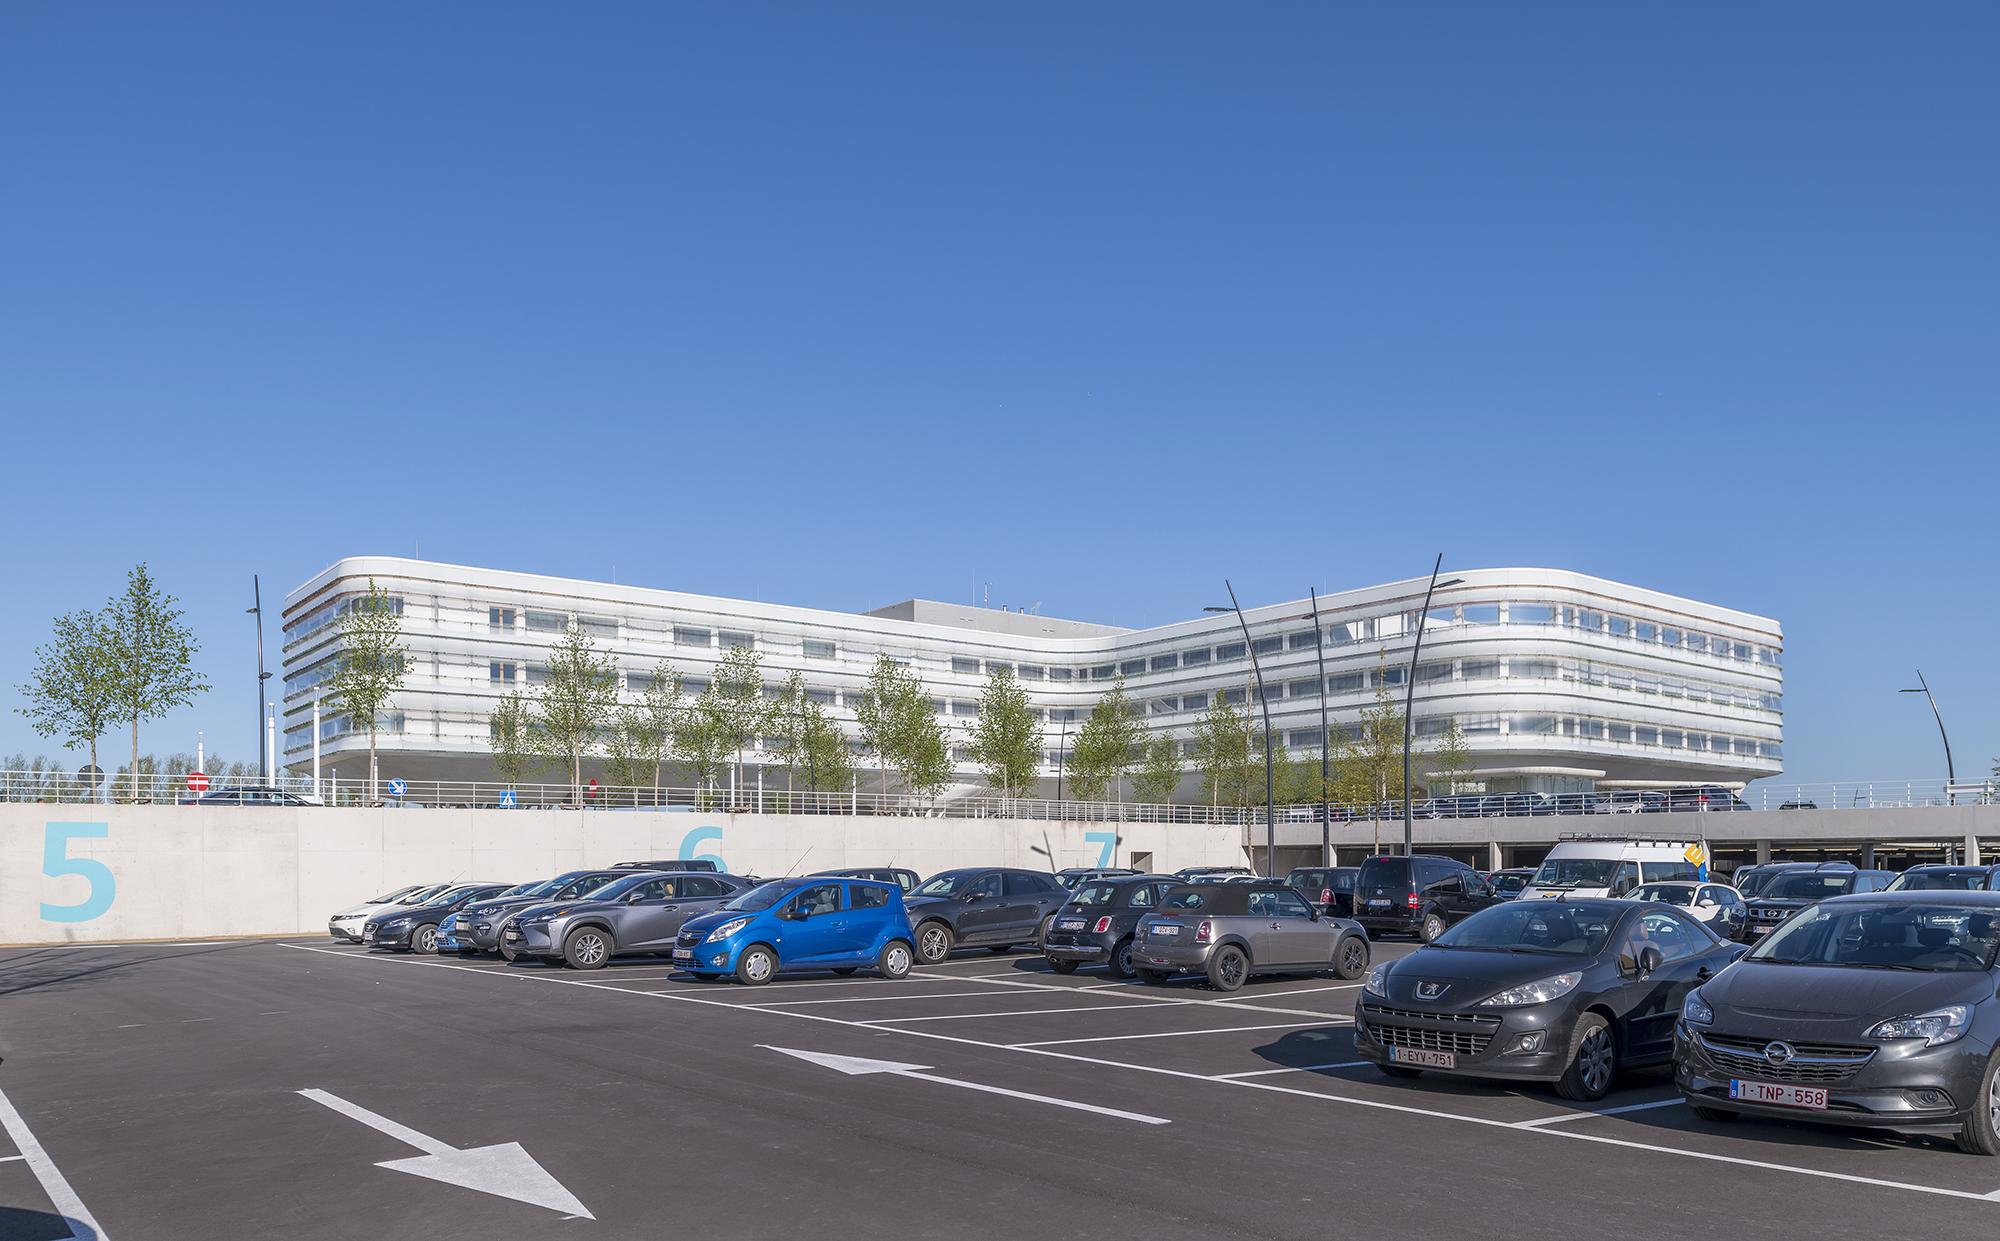 AZ Zeno Hospital For B2ai Architects — Tim Fisher